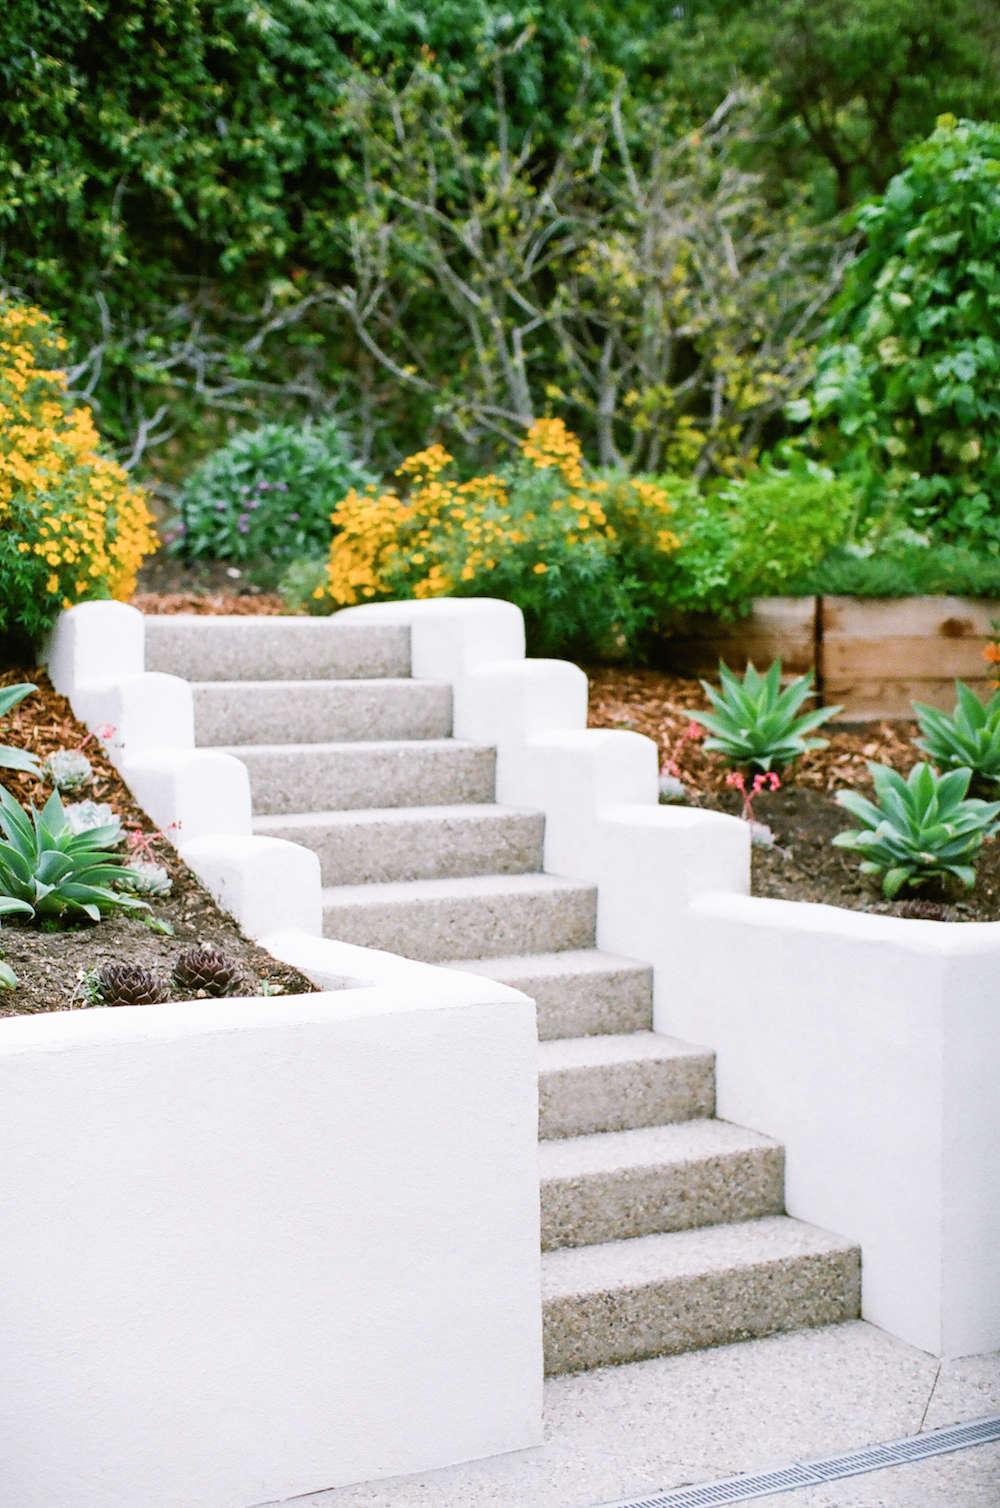 10 Genius Garden Hacks With Poured Concrete Gardenista